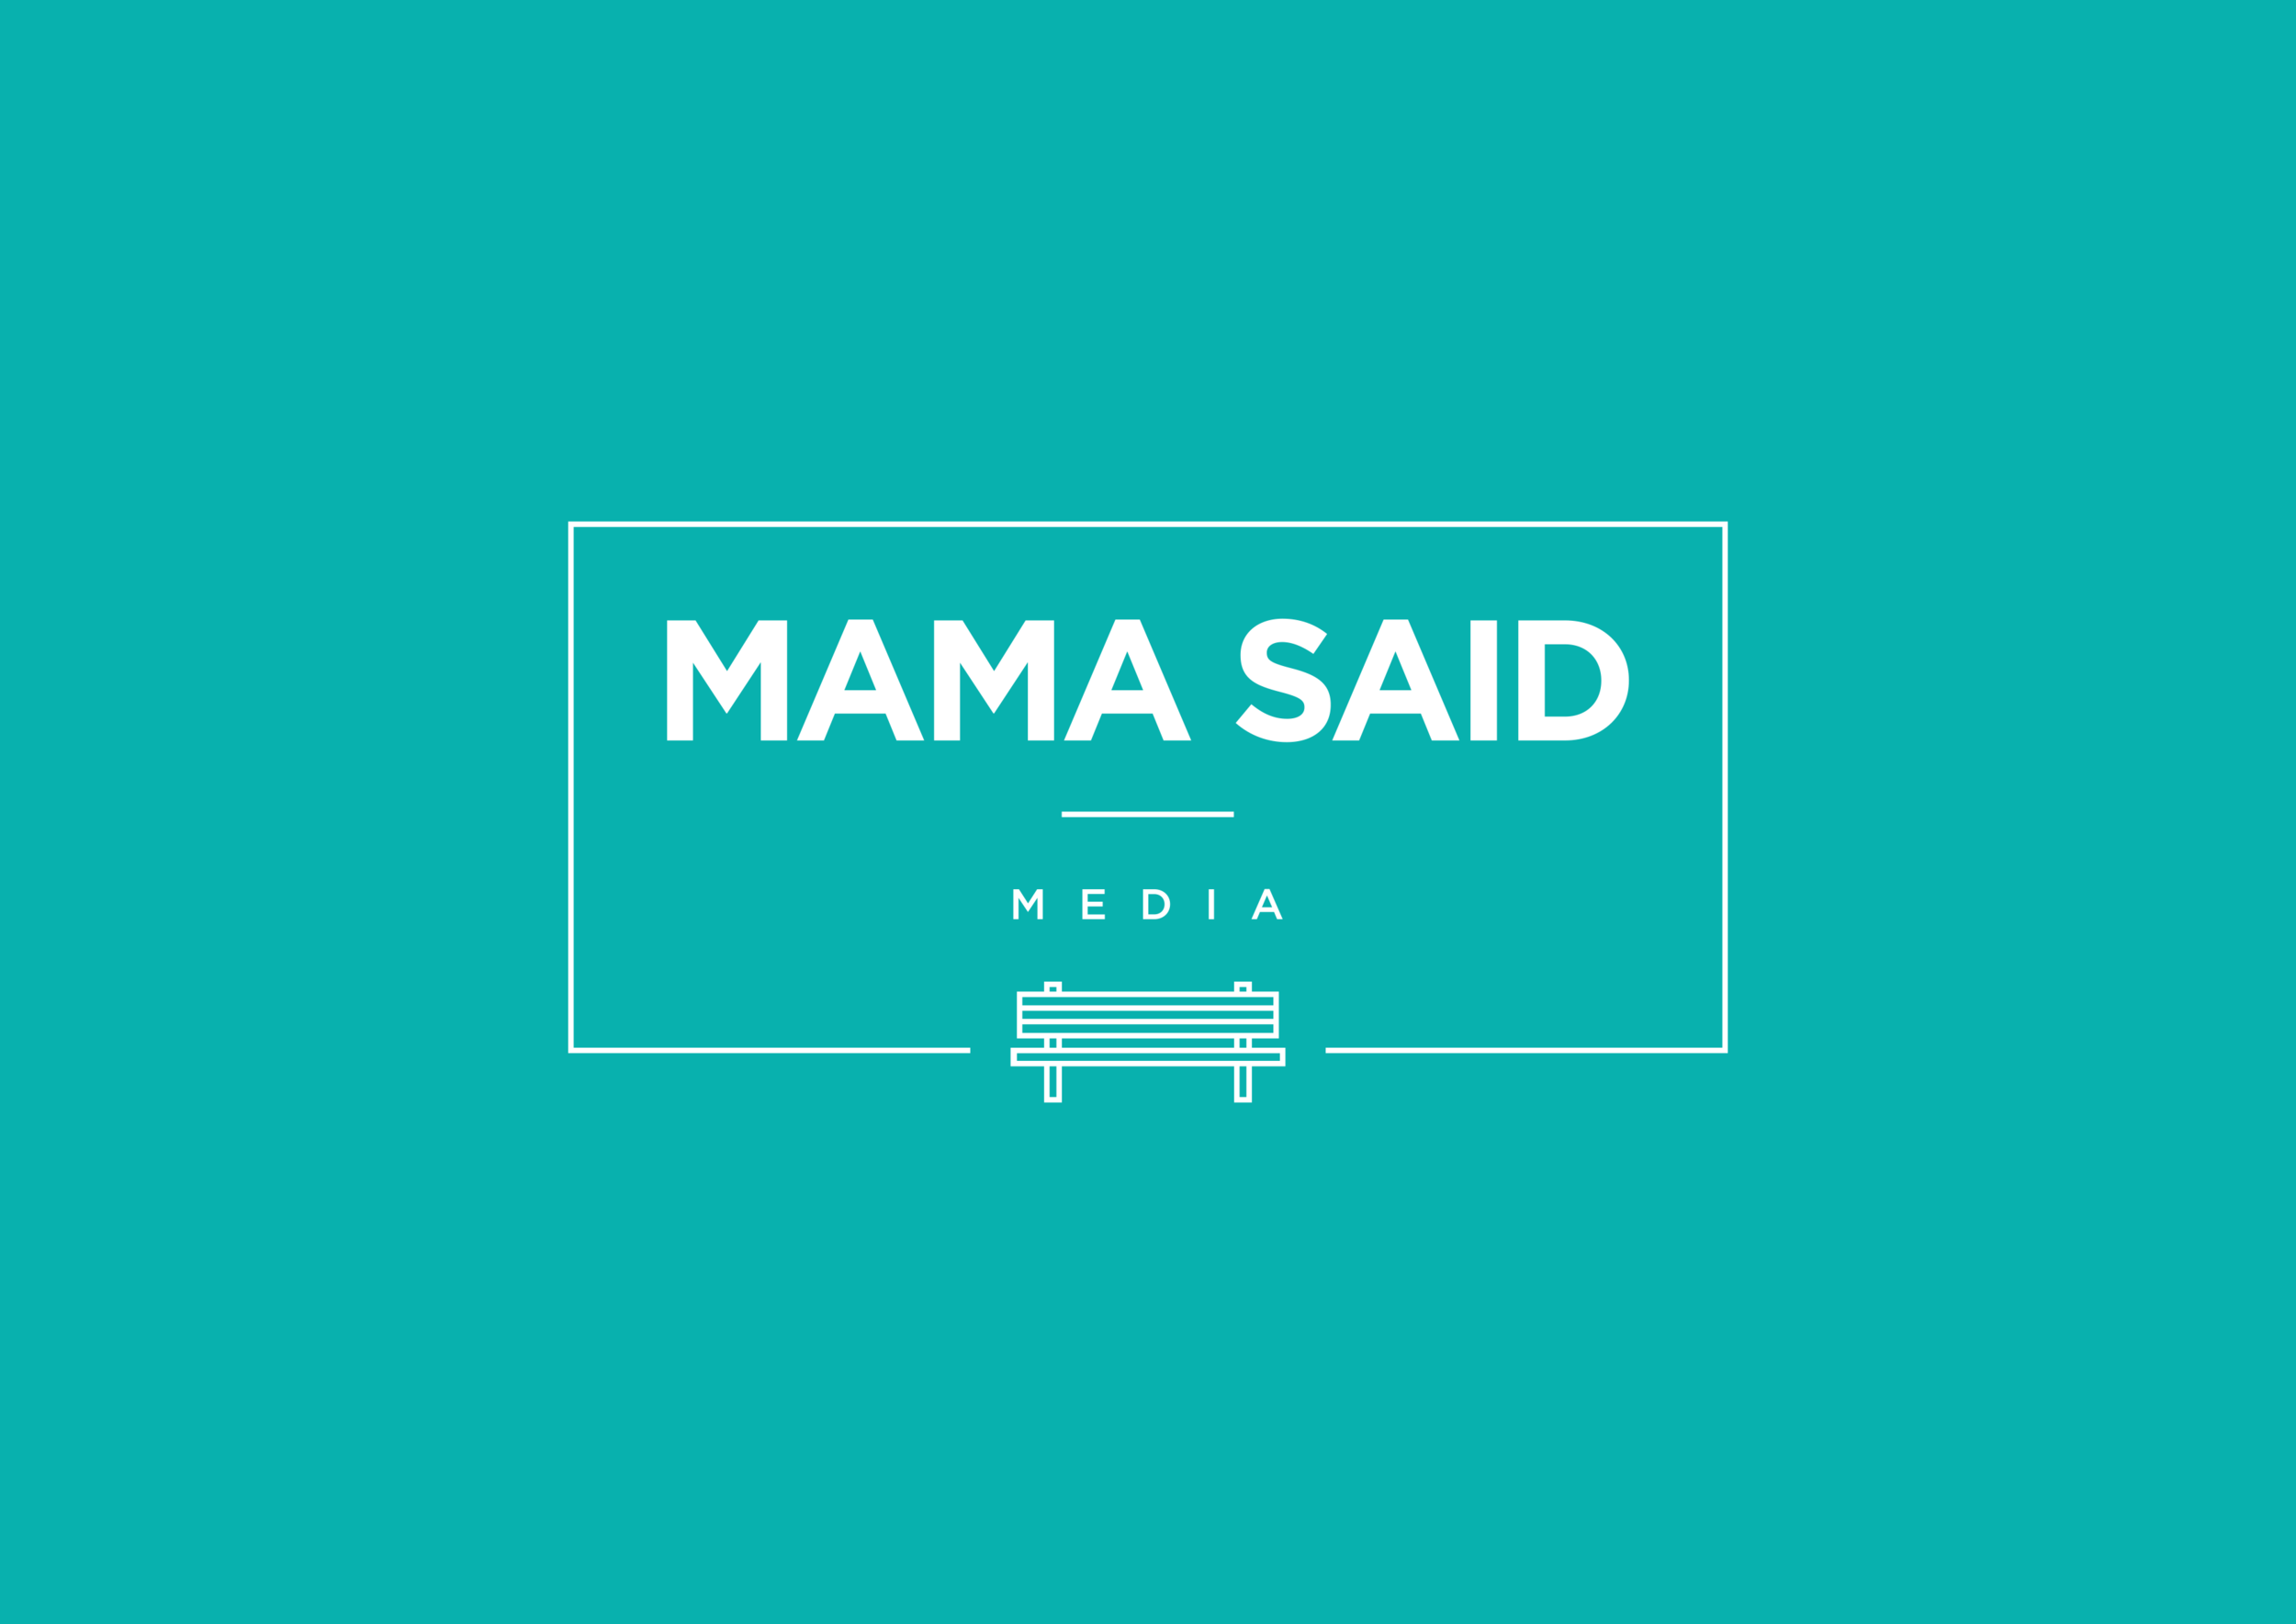 mama_said_media_2.png